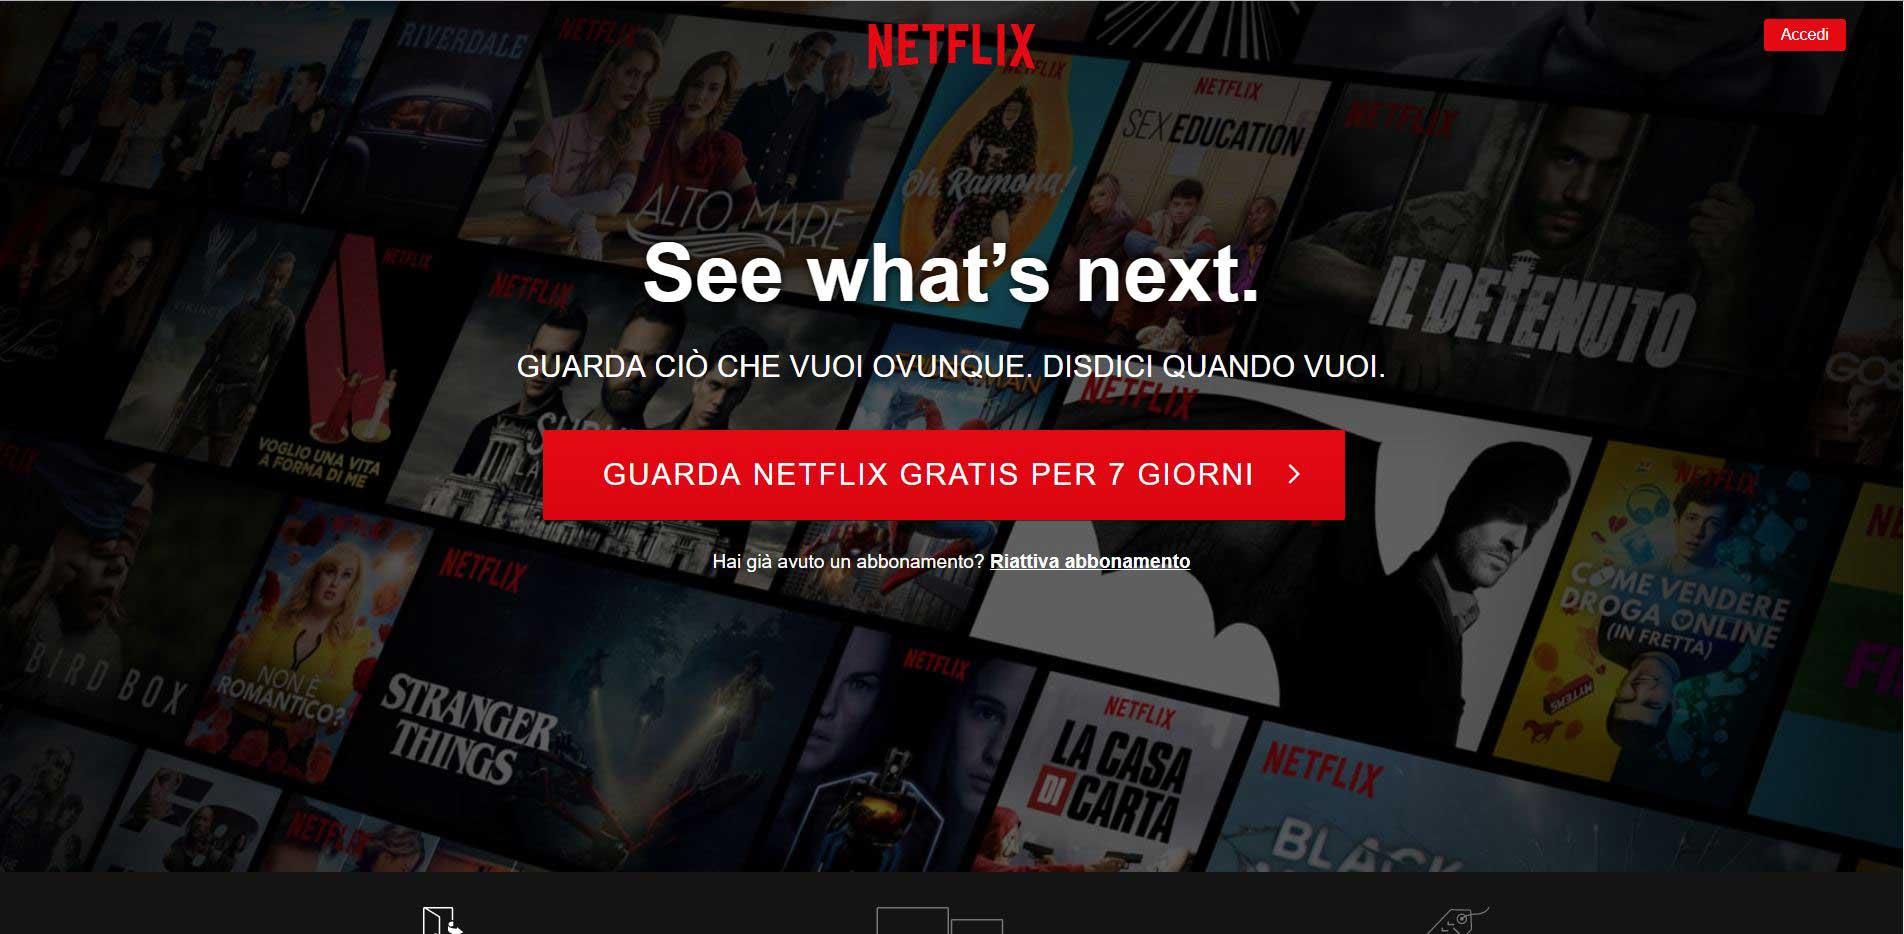 Come vedere Netflix su Sky   Salvatore Aranzulla